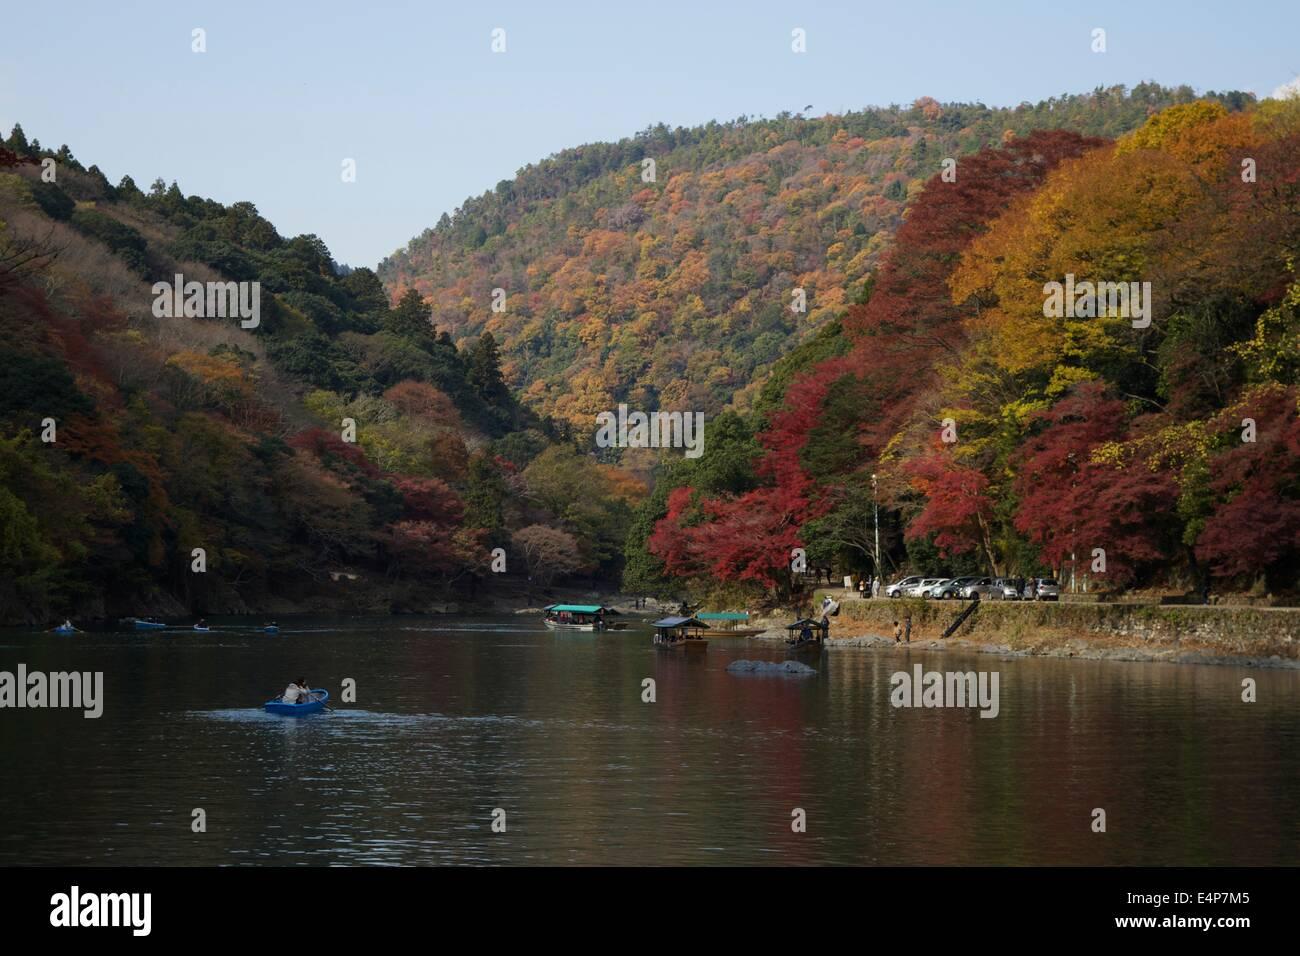 Fall Colors Along Hozu River in Arashiyama, Kyoto, Japan - Stock Image